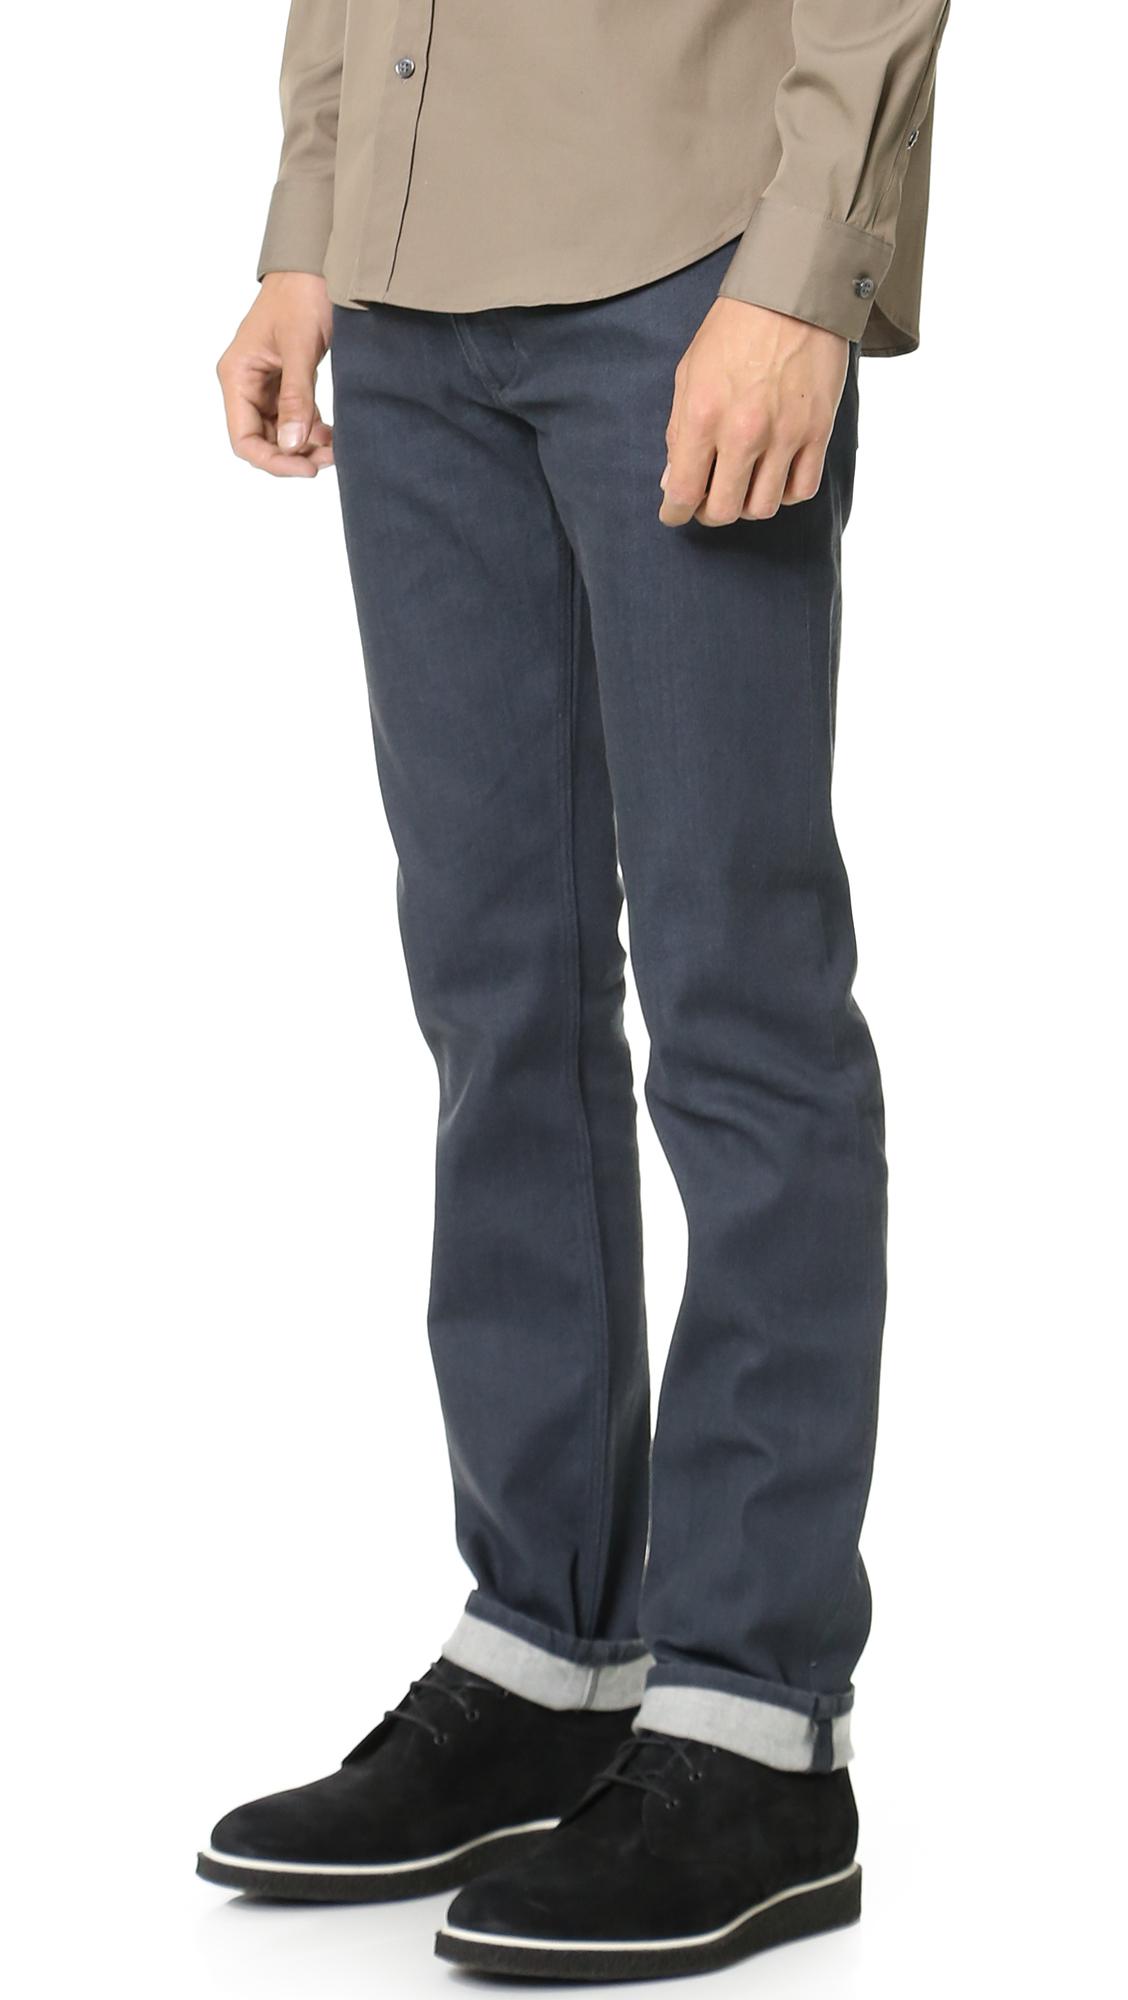 Theory Raffi Stroud Jeans in Grey (Grey) for Men